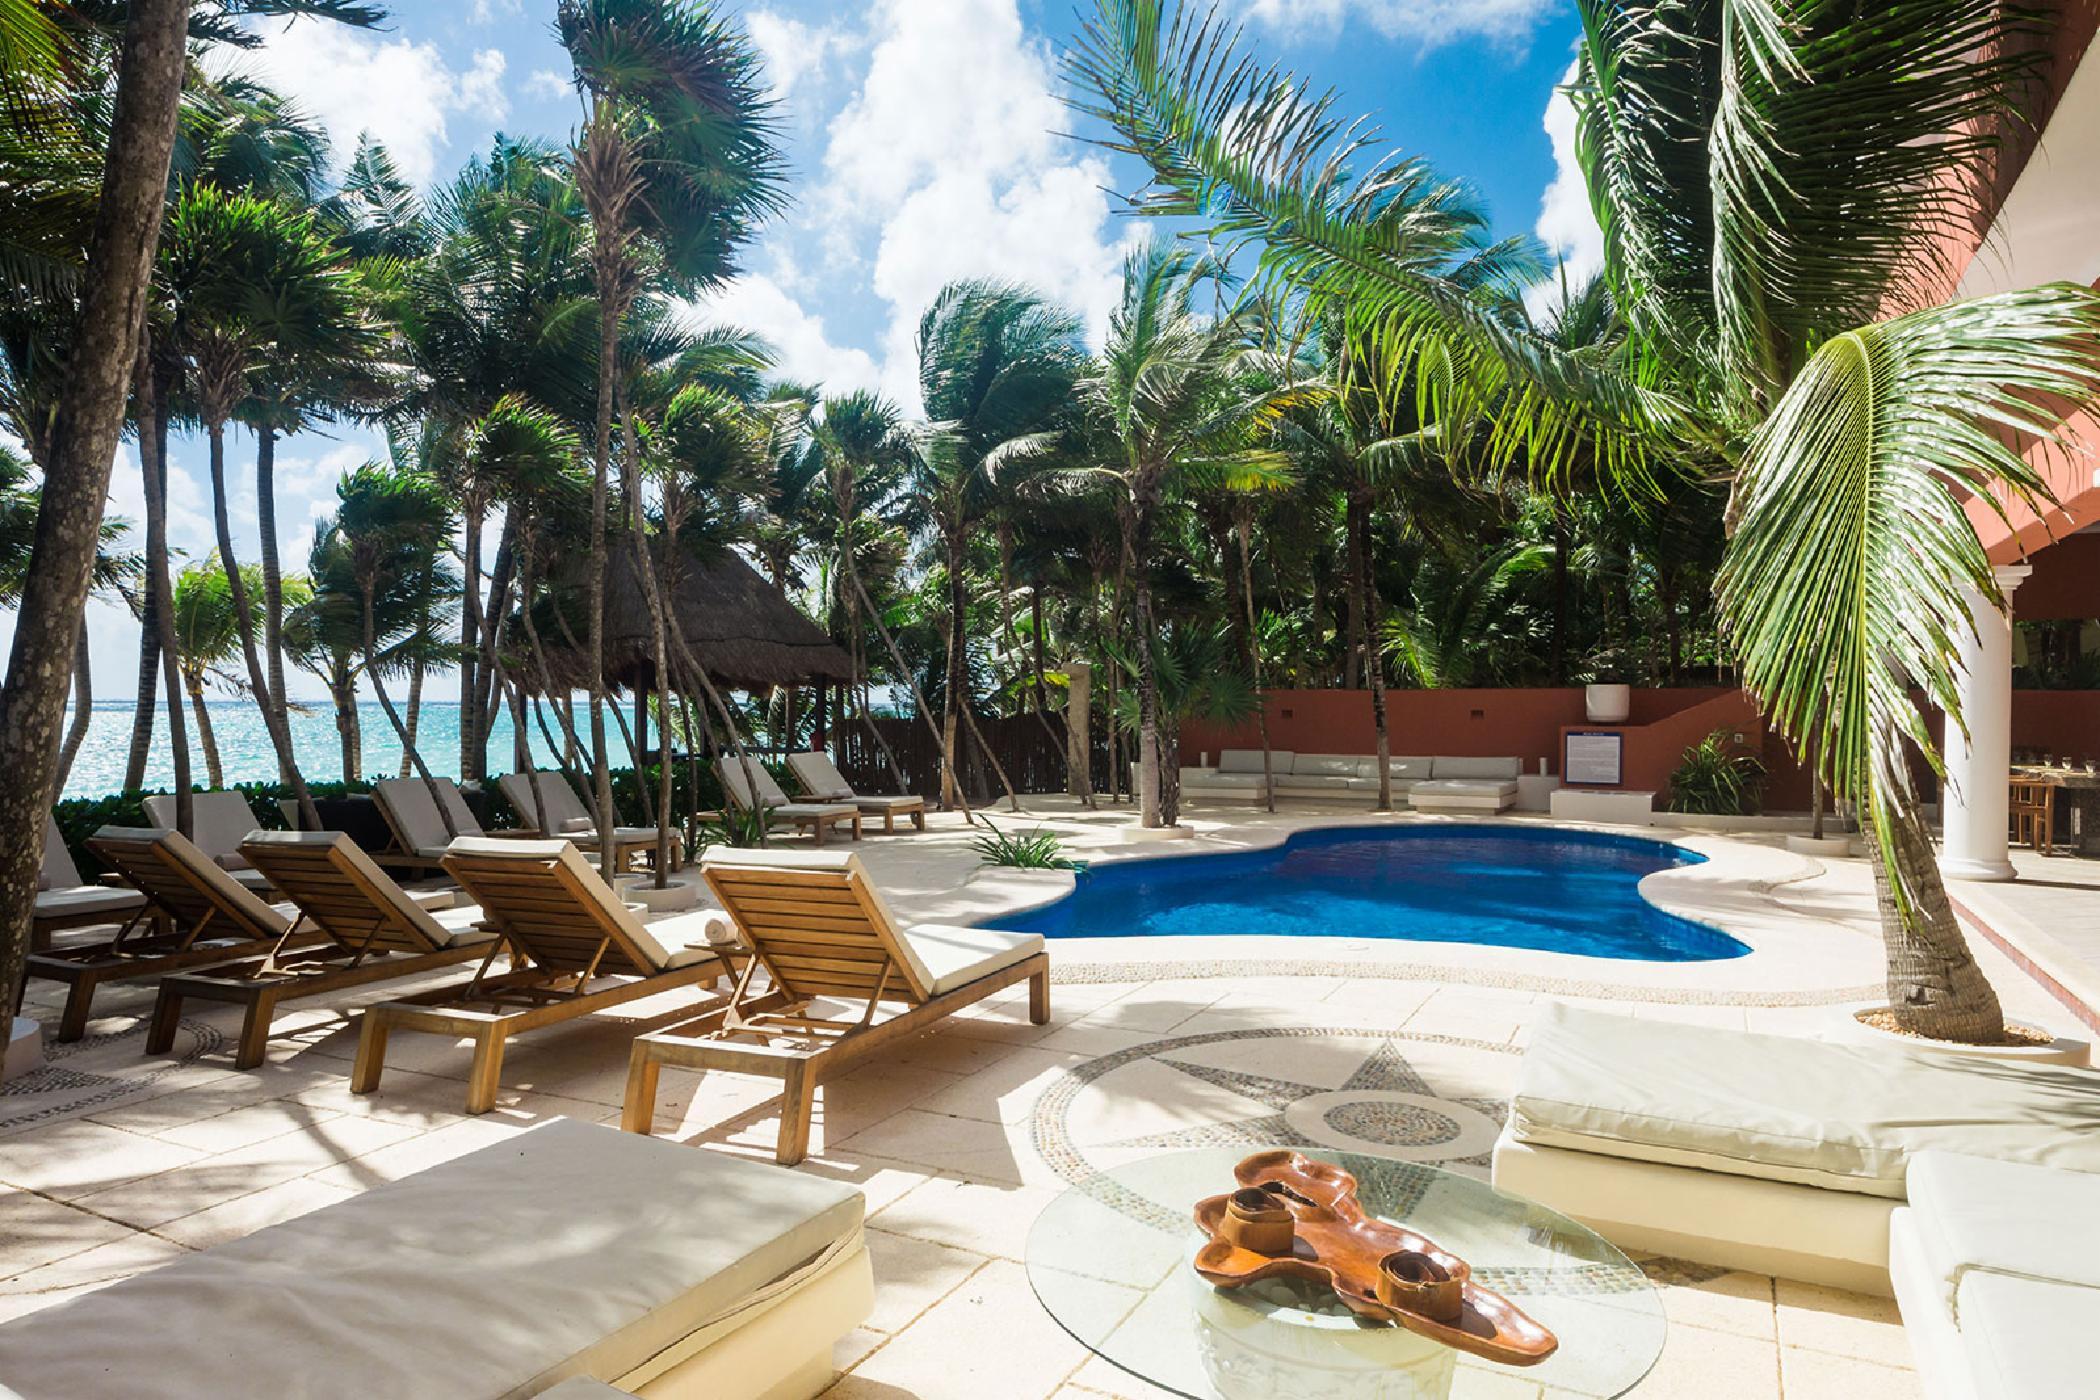 Agents_Maya_Luxe_Riviera_Maya_Luxury_Villas_Casa_Yardena3.jpg